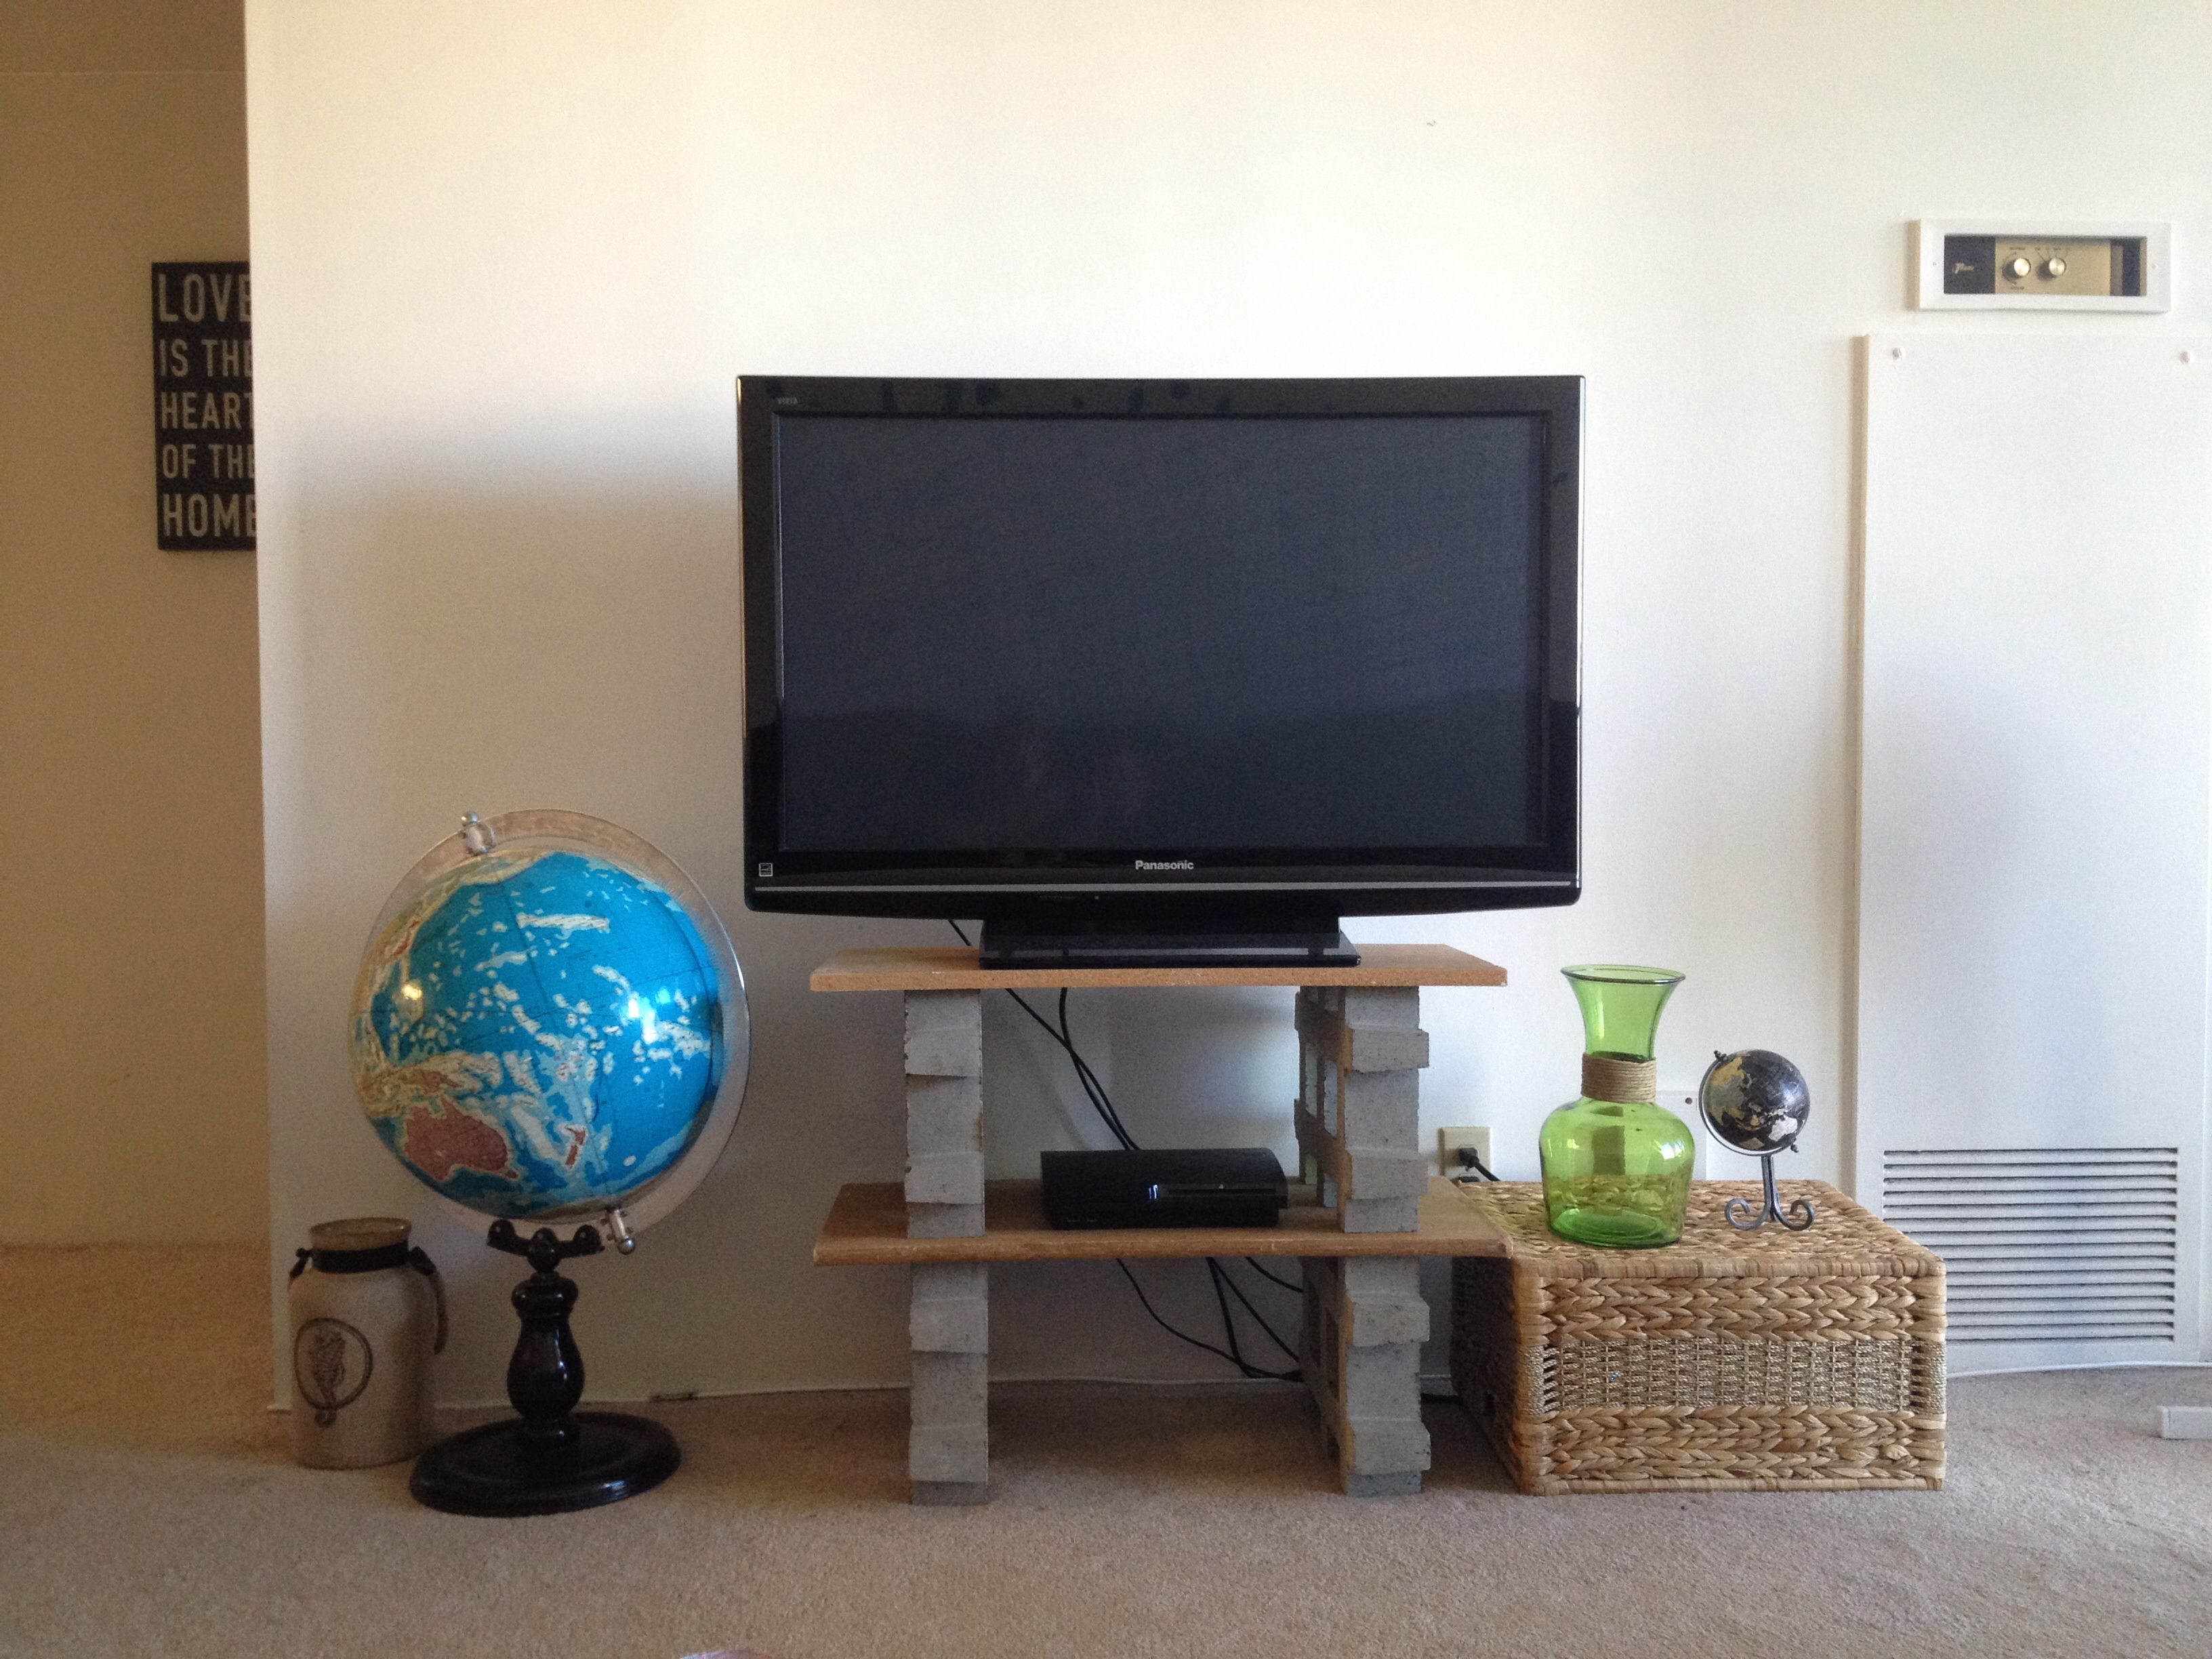 Pinterest Inspired Diy Tv Stand Blocks 4 15 At Home Depot Wood